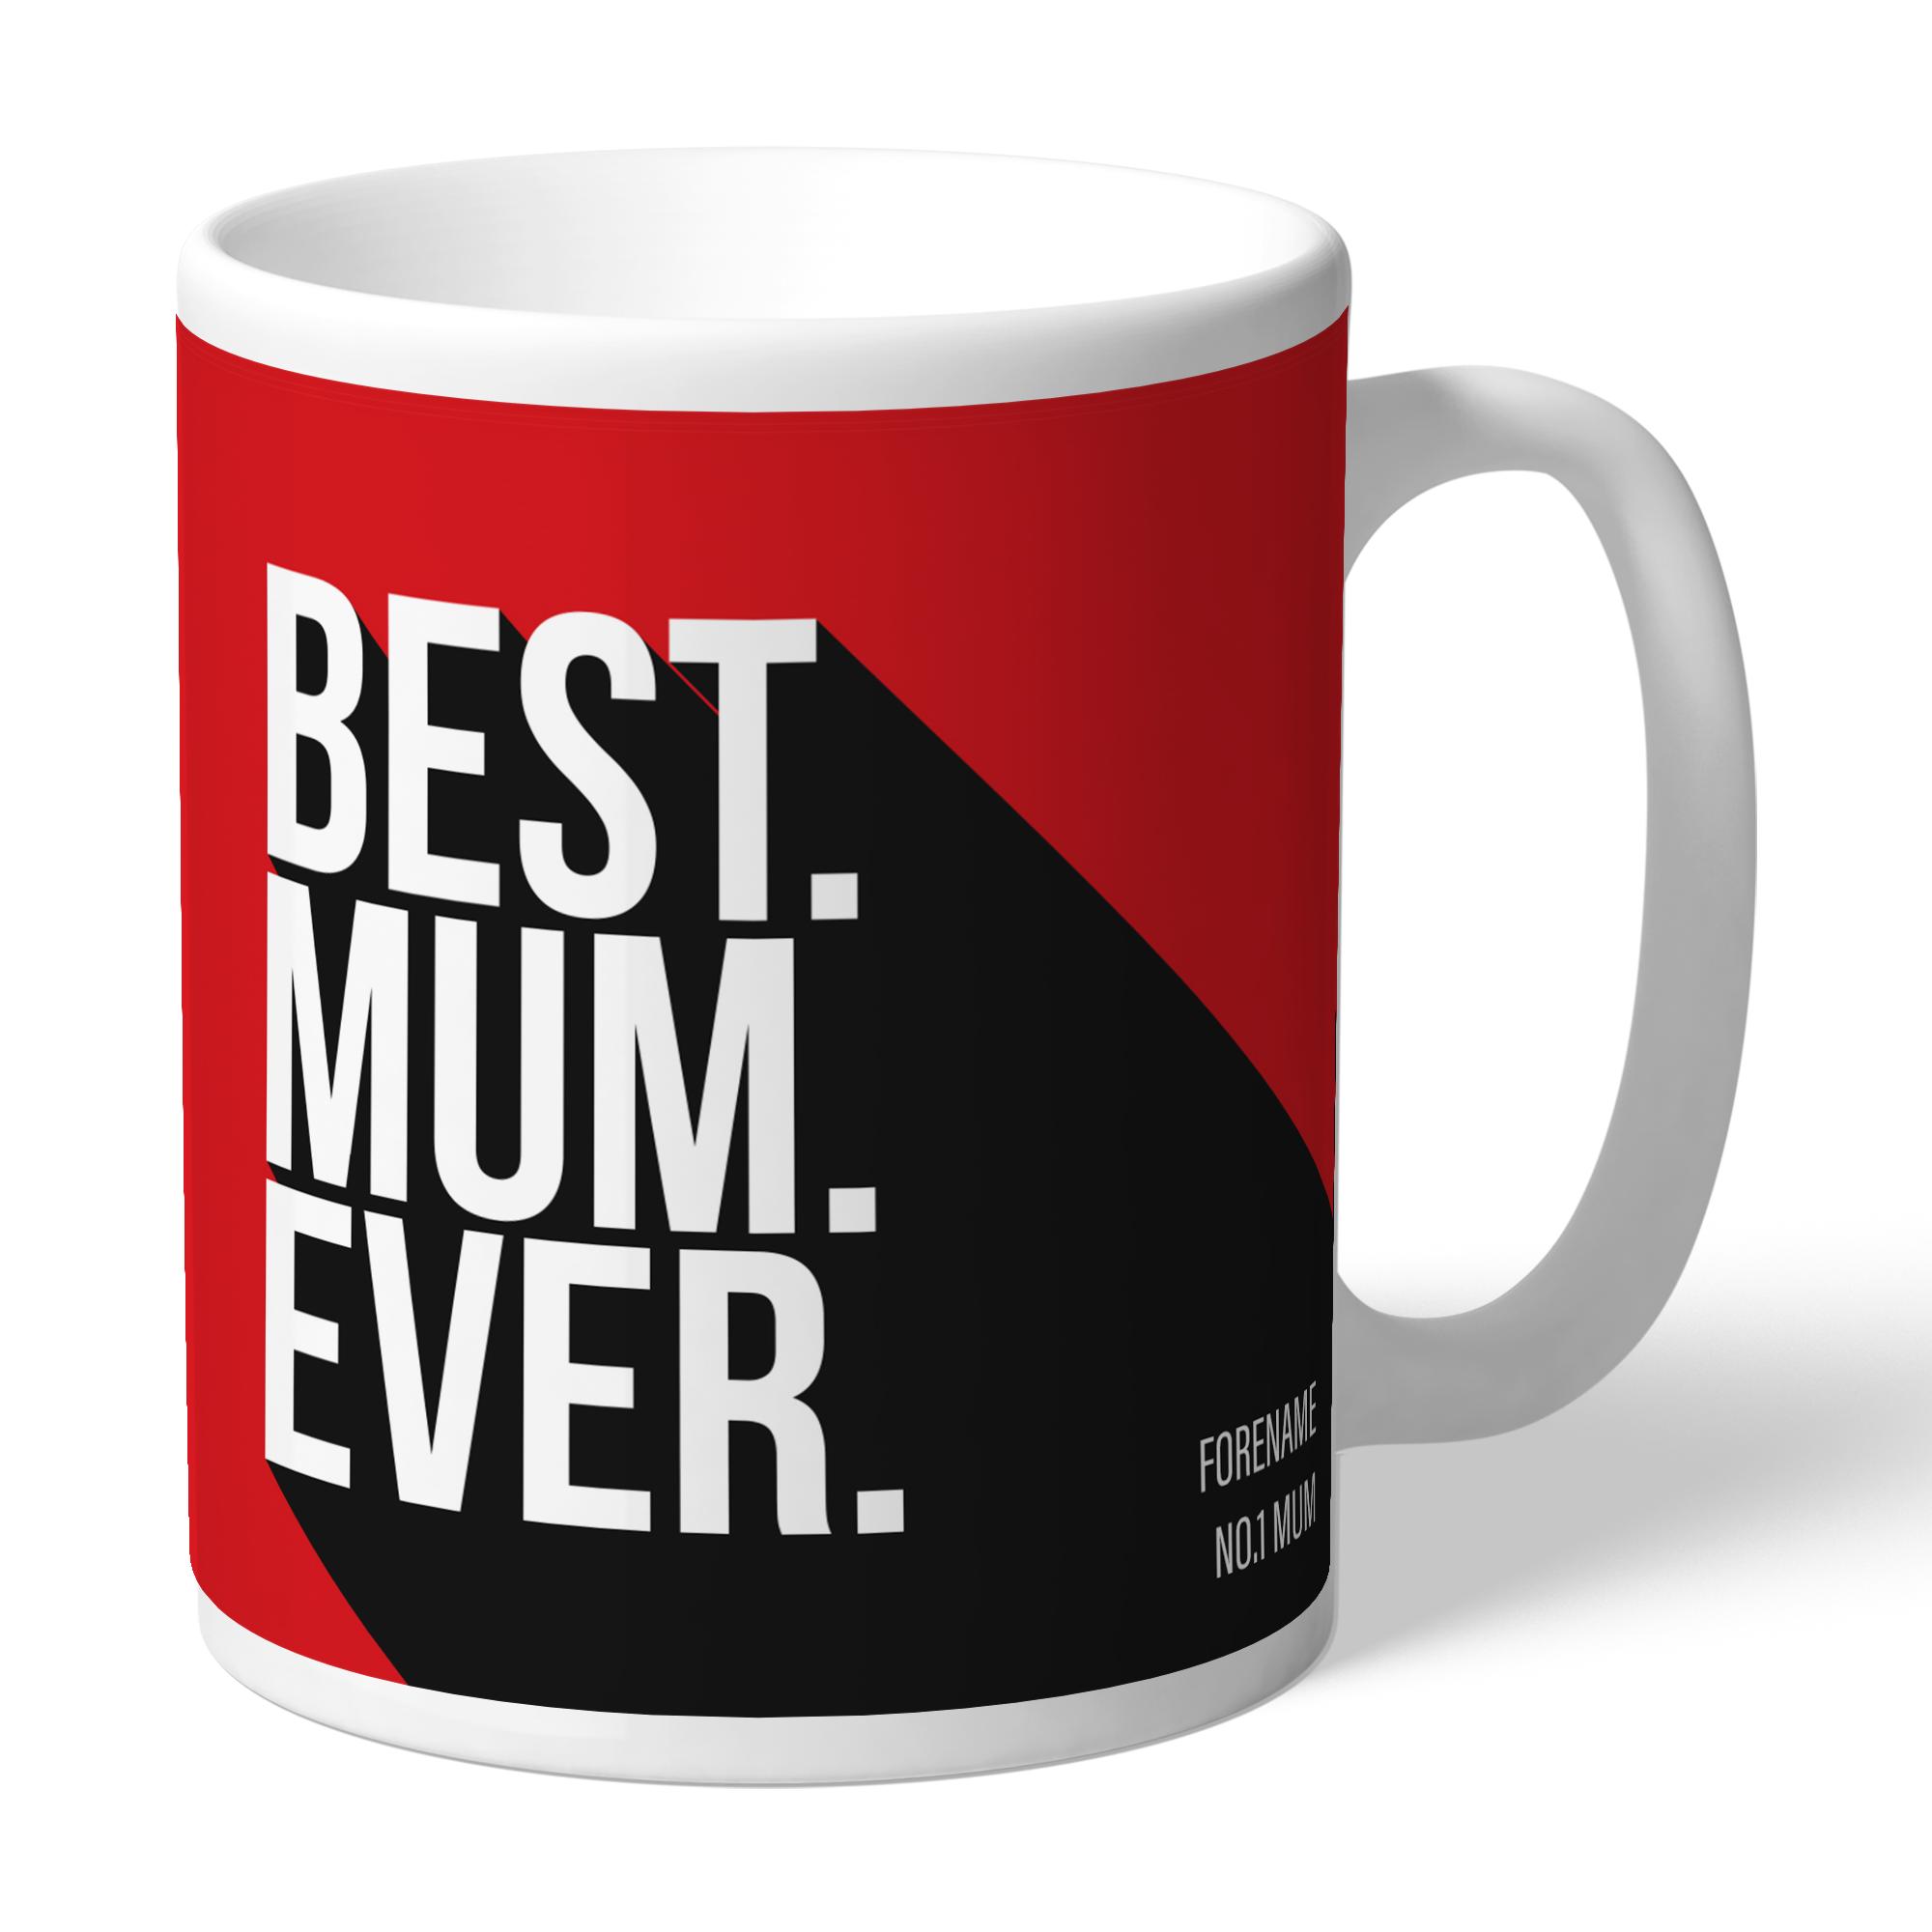 Southampton FC Best Mum Ever Mug